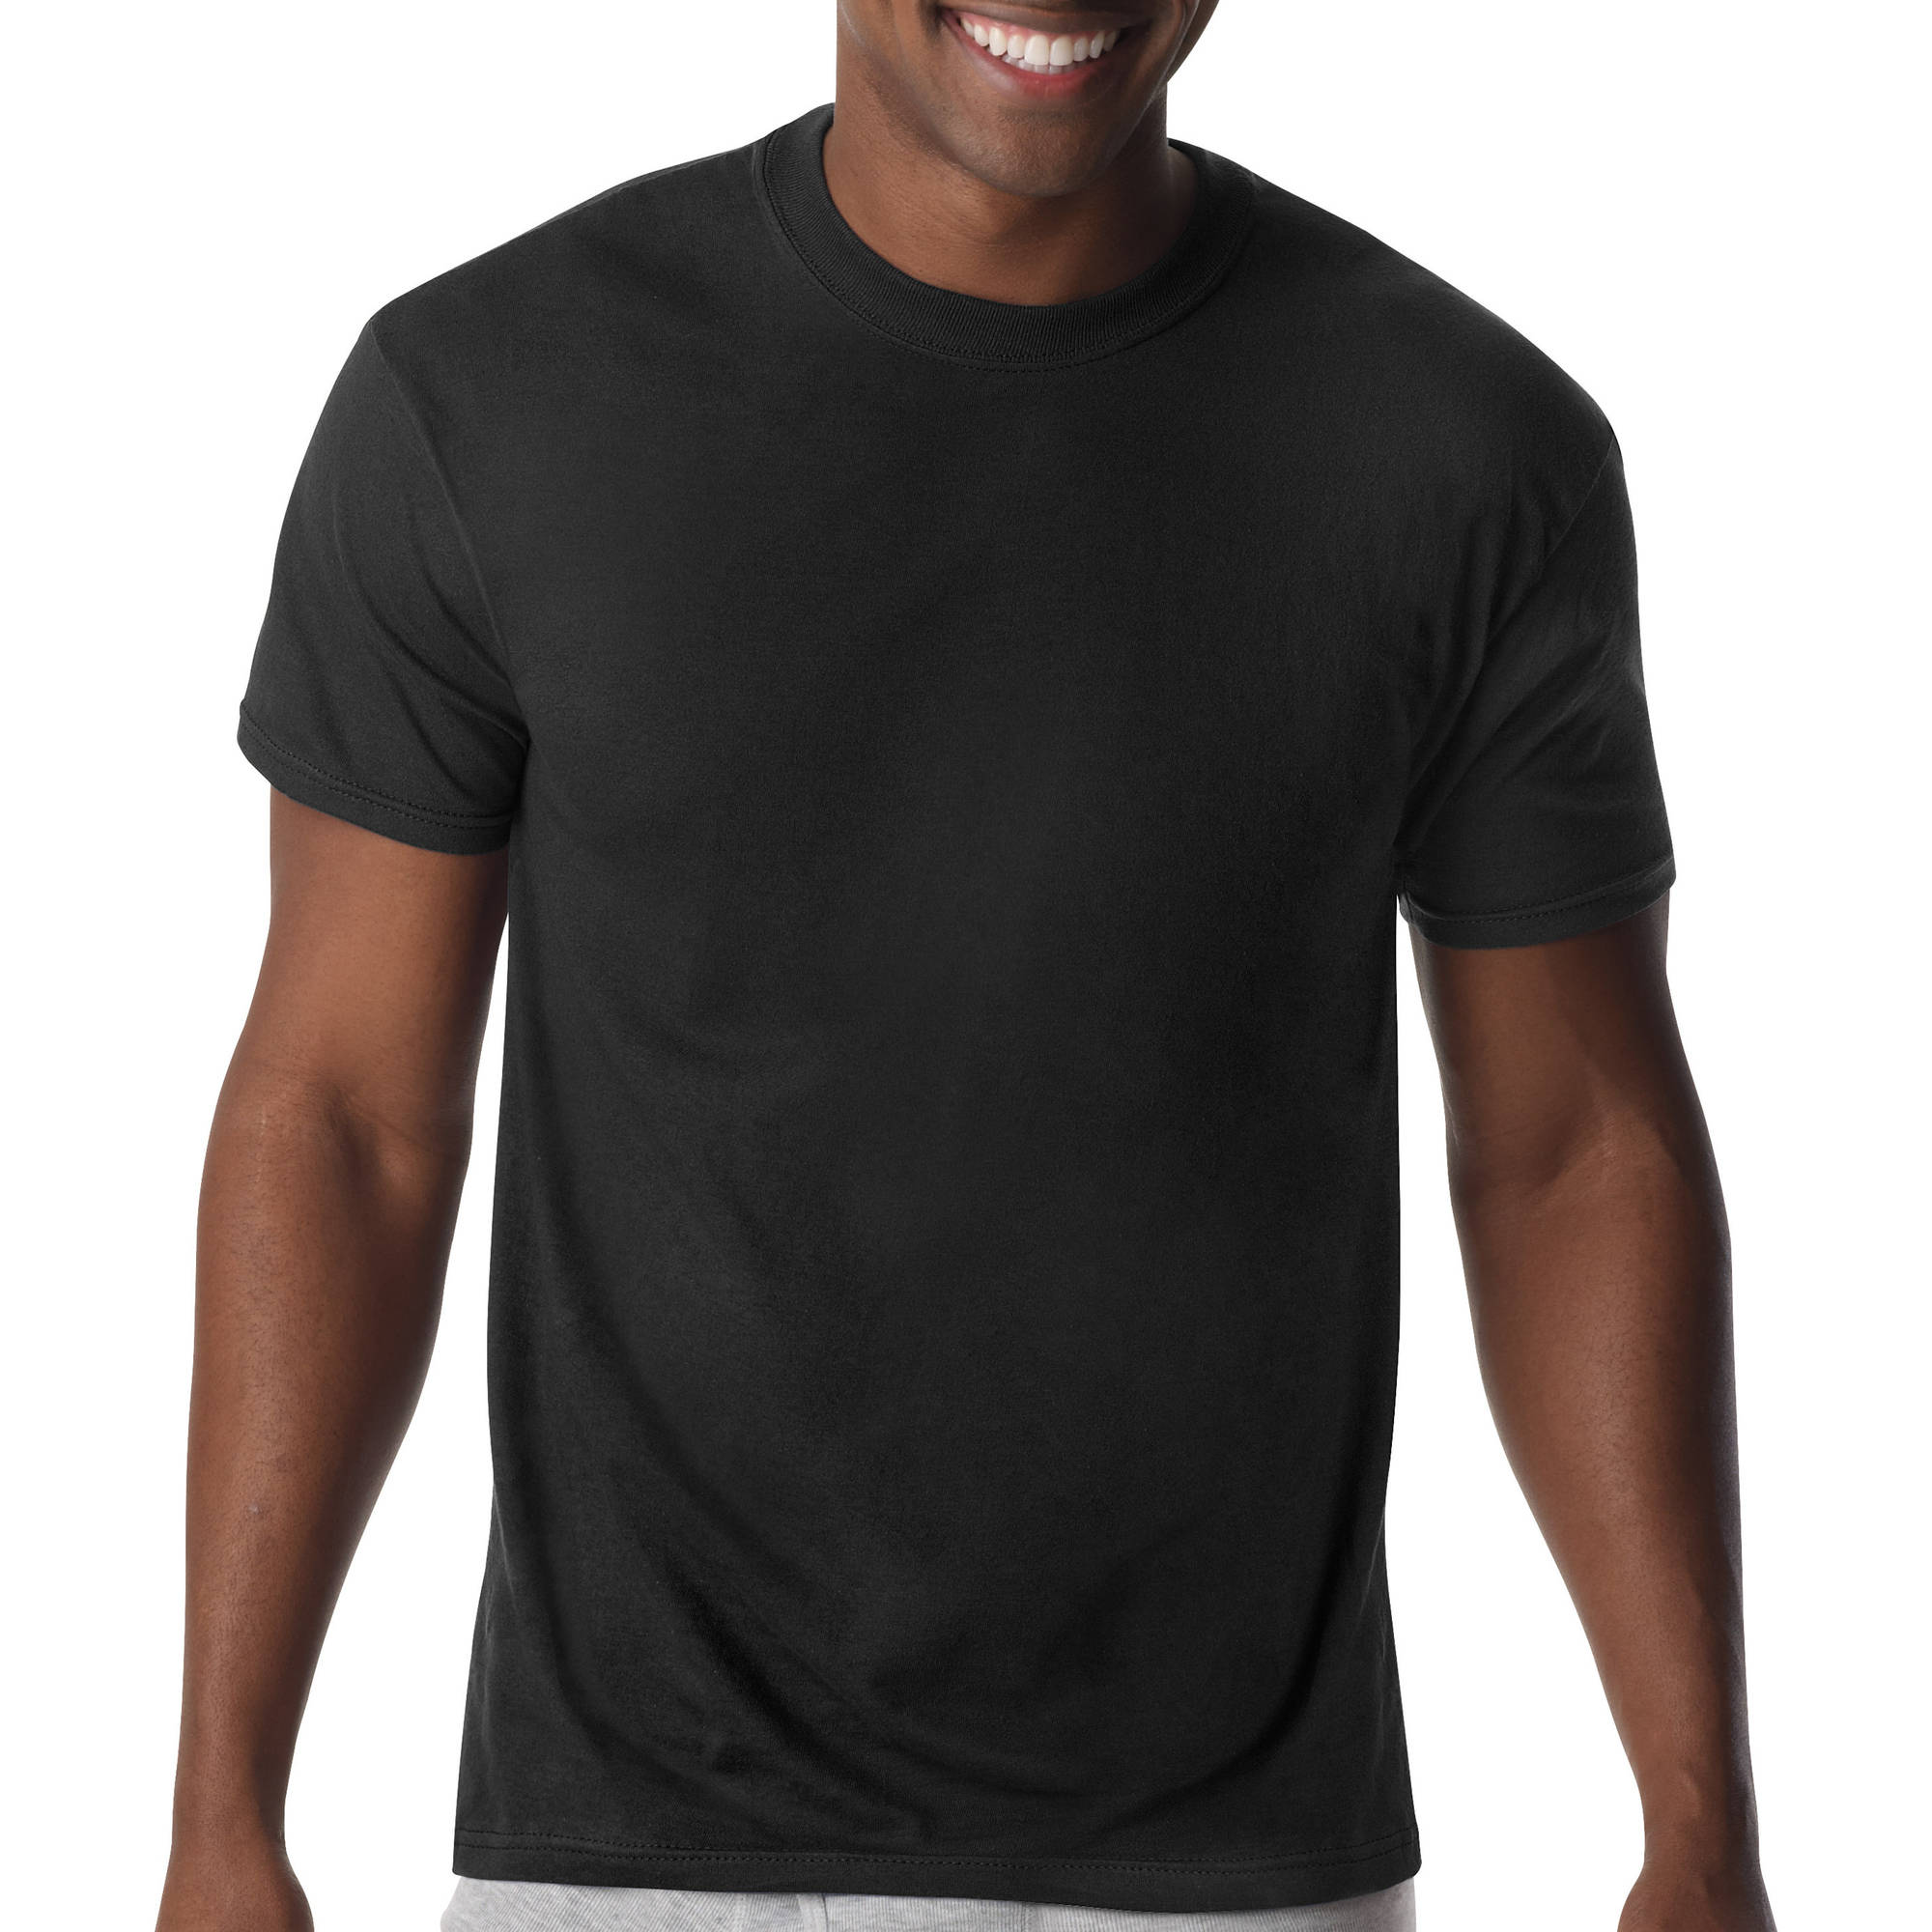 Hanes Big Men's FreshIQ ComfortBlend Crew Neck T-Shirts 3-Pack, 2XL